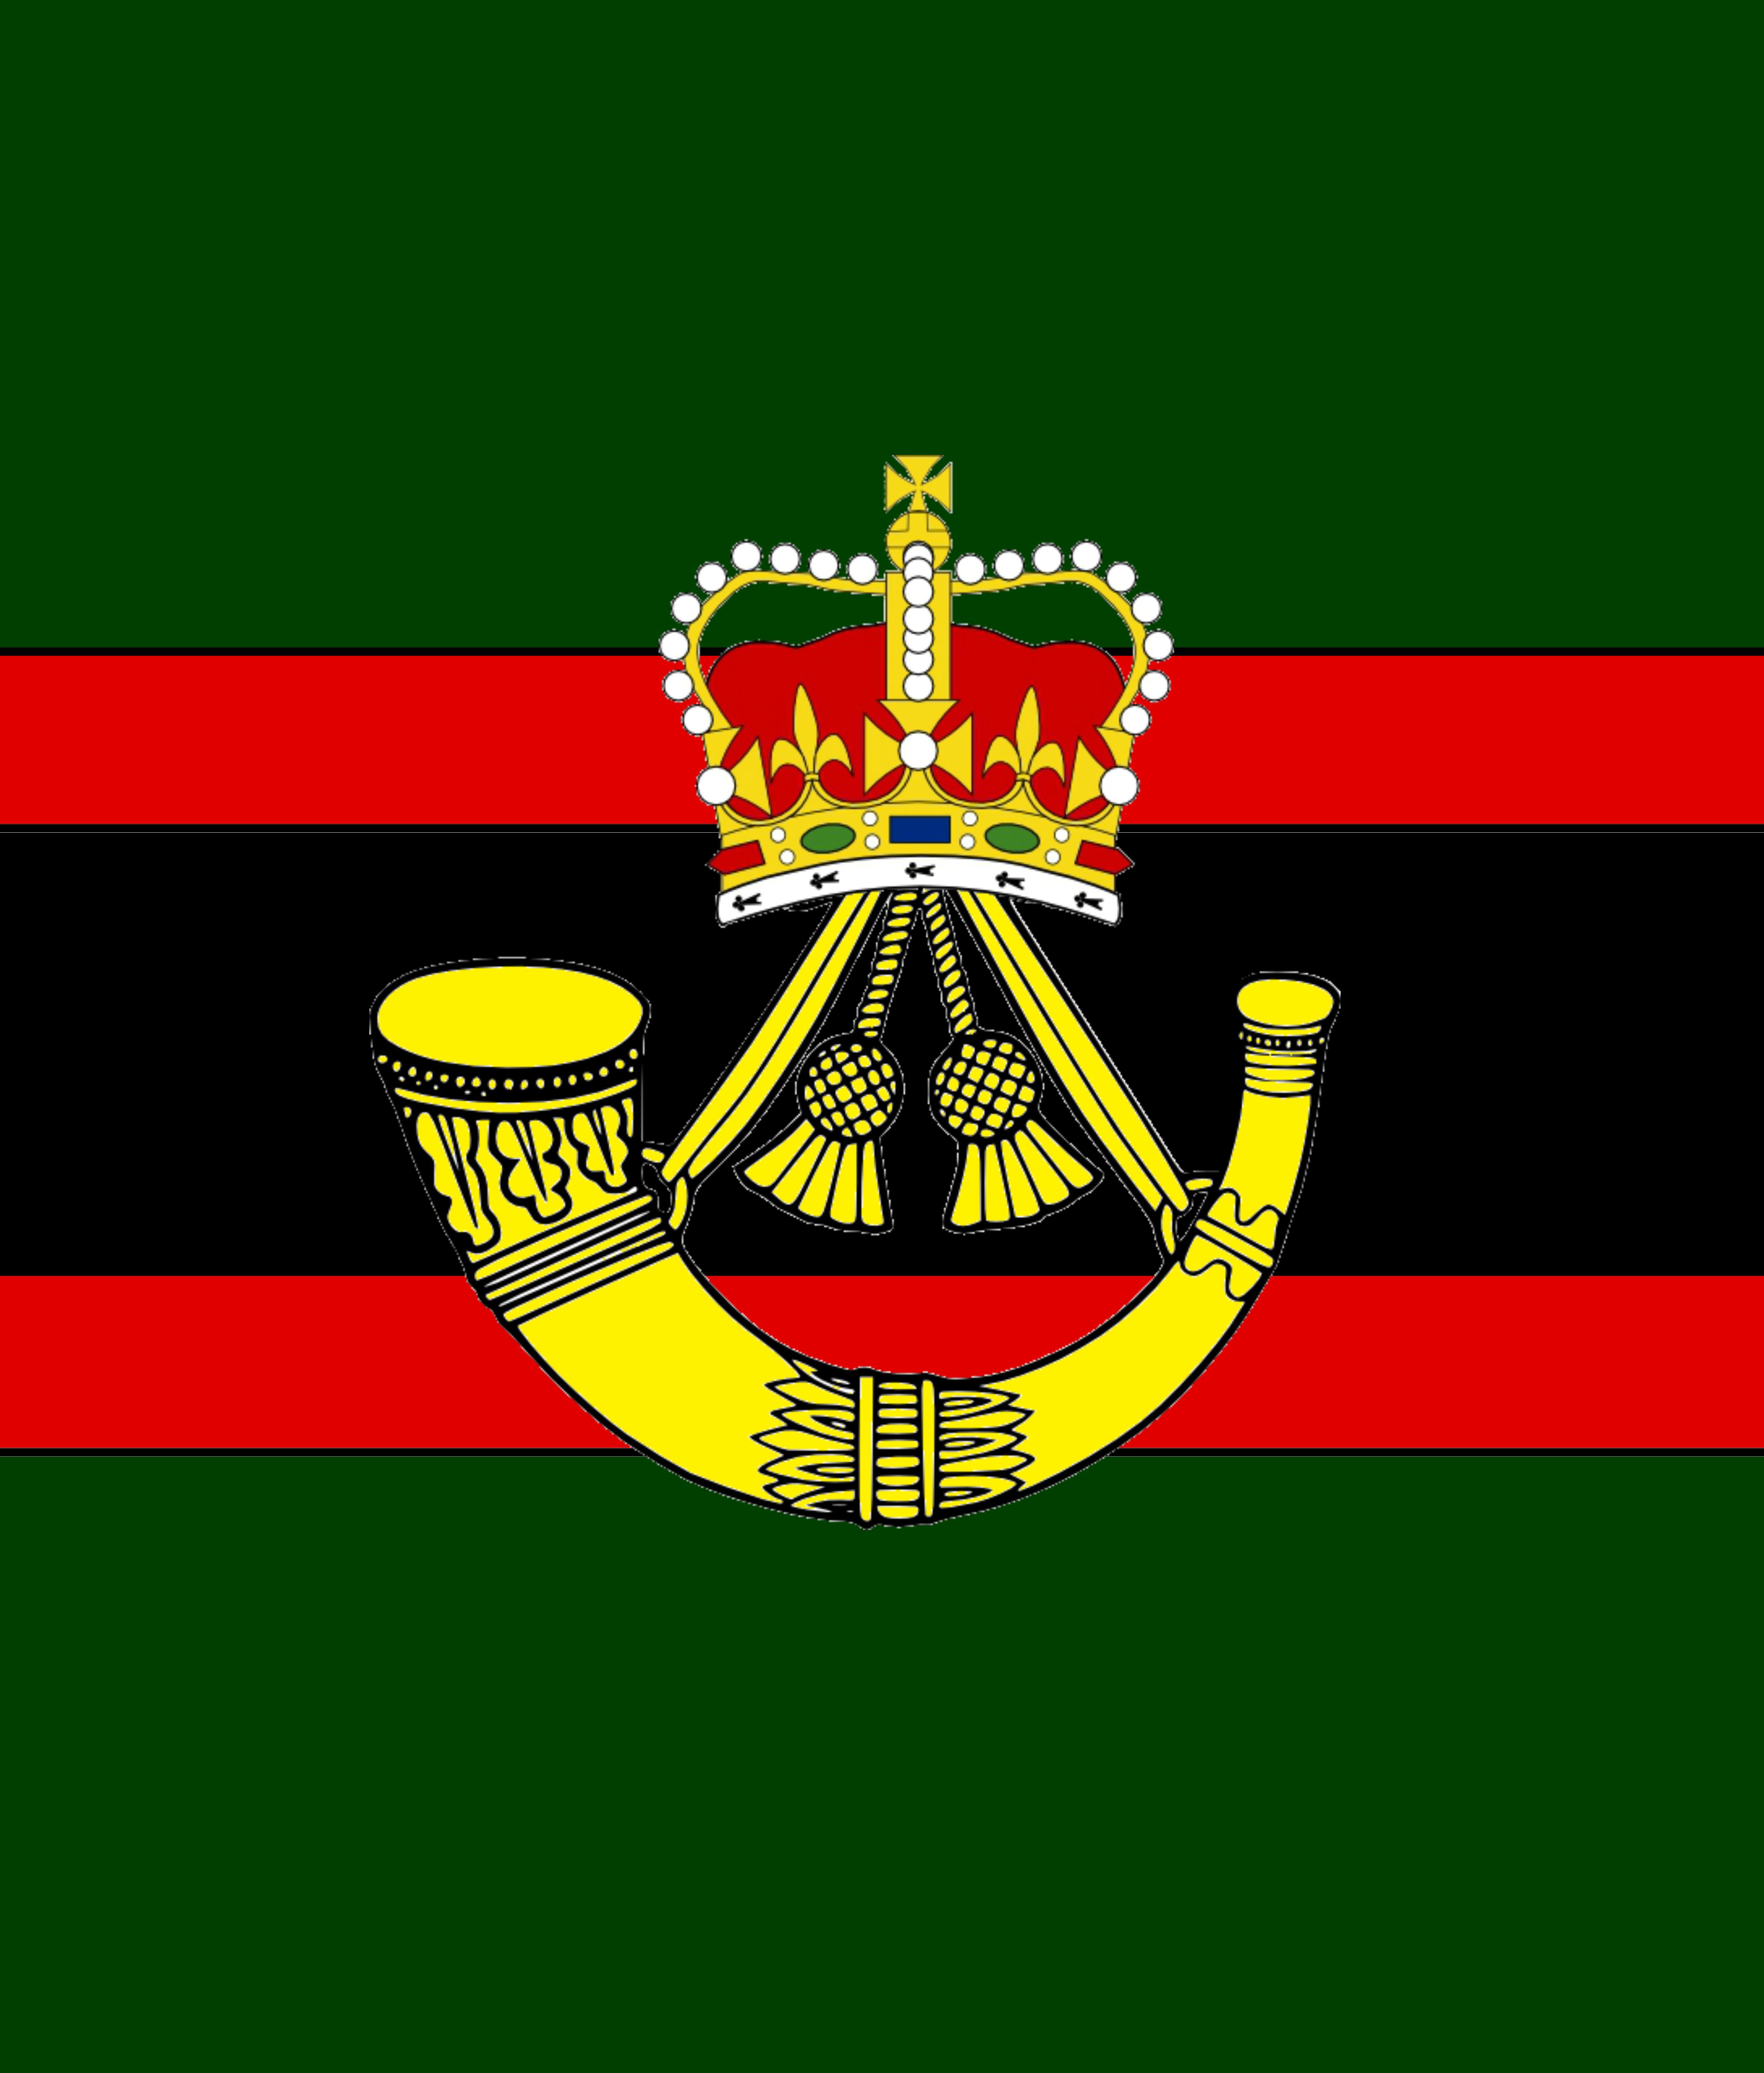 5/' x 3/' Household Division Flag British Army Regiment Regiment Military Banner